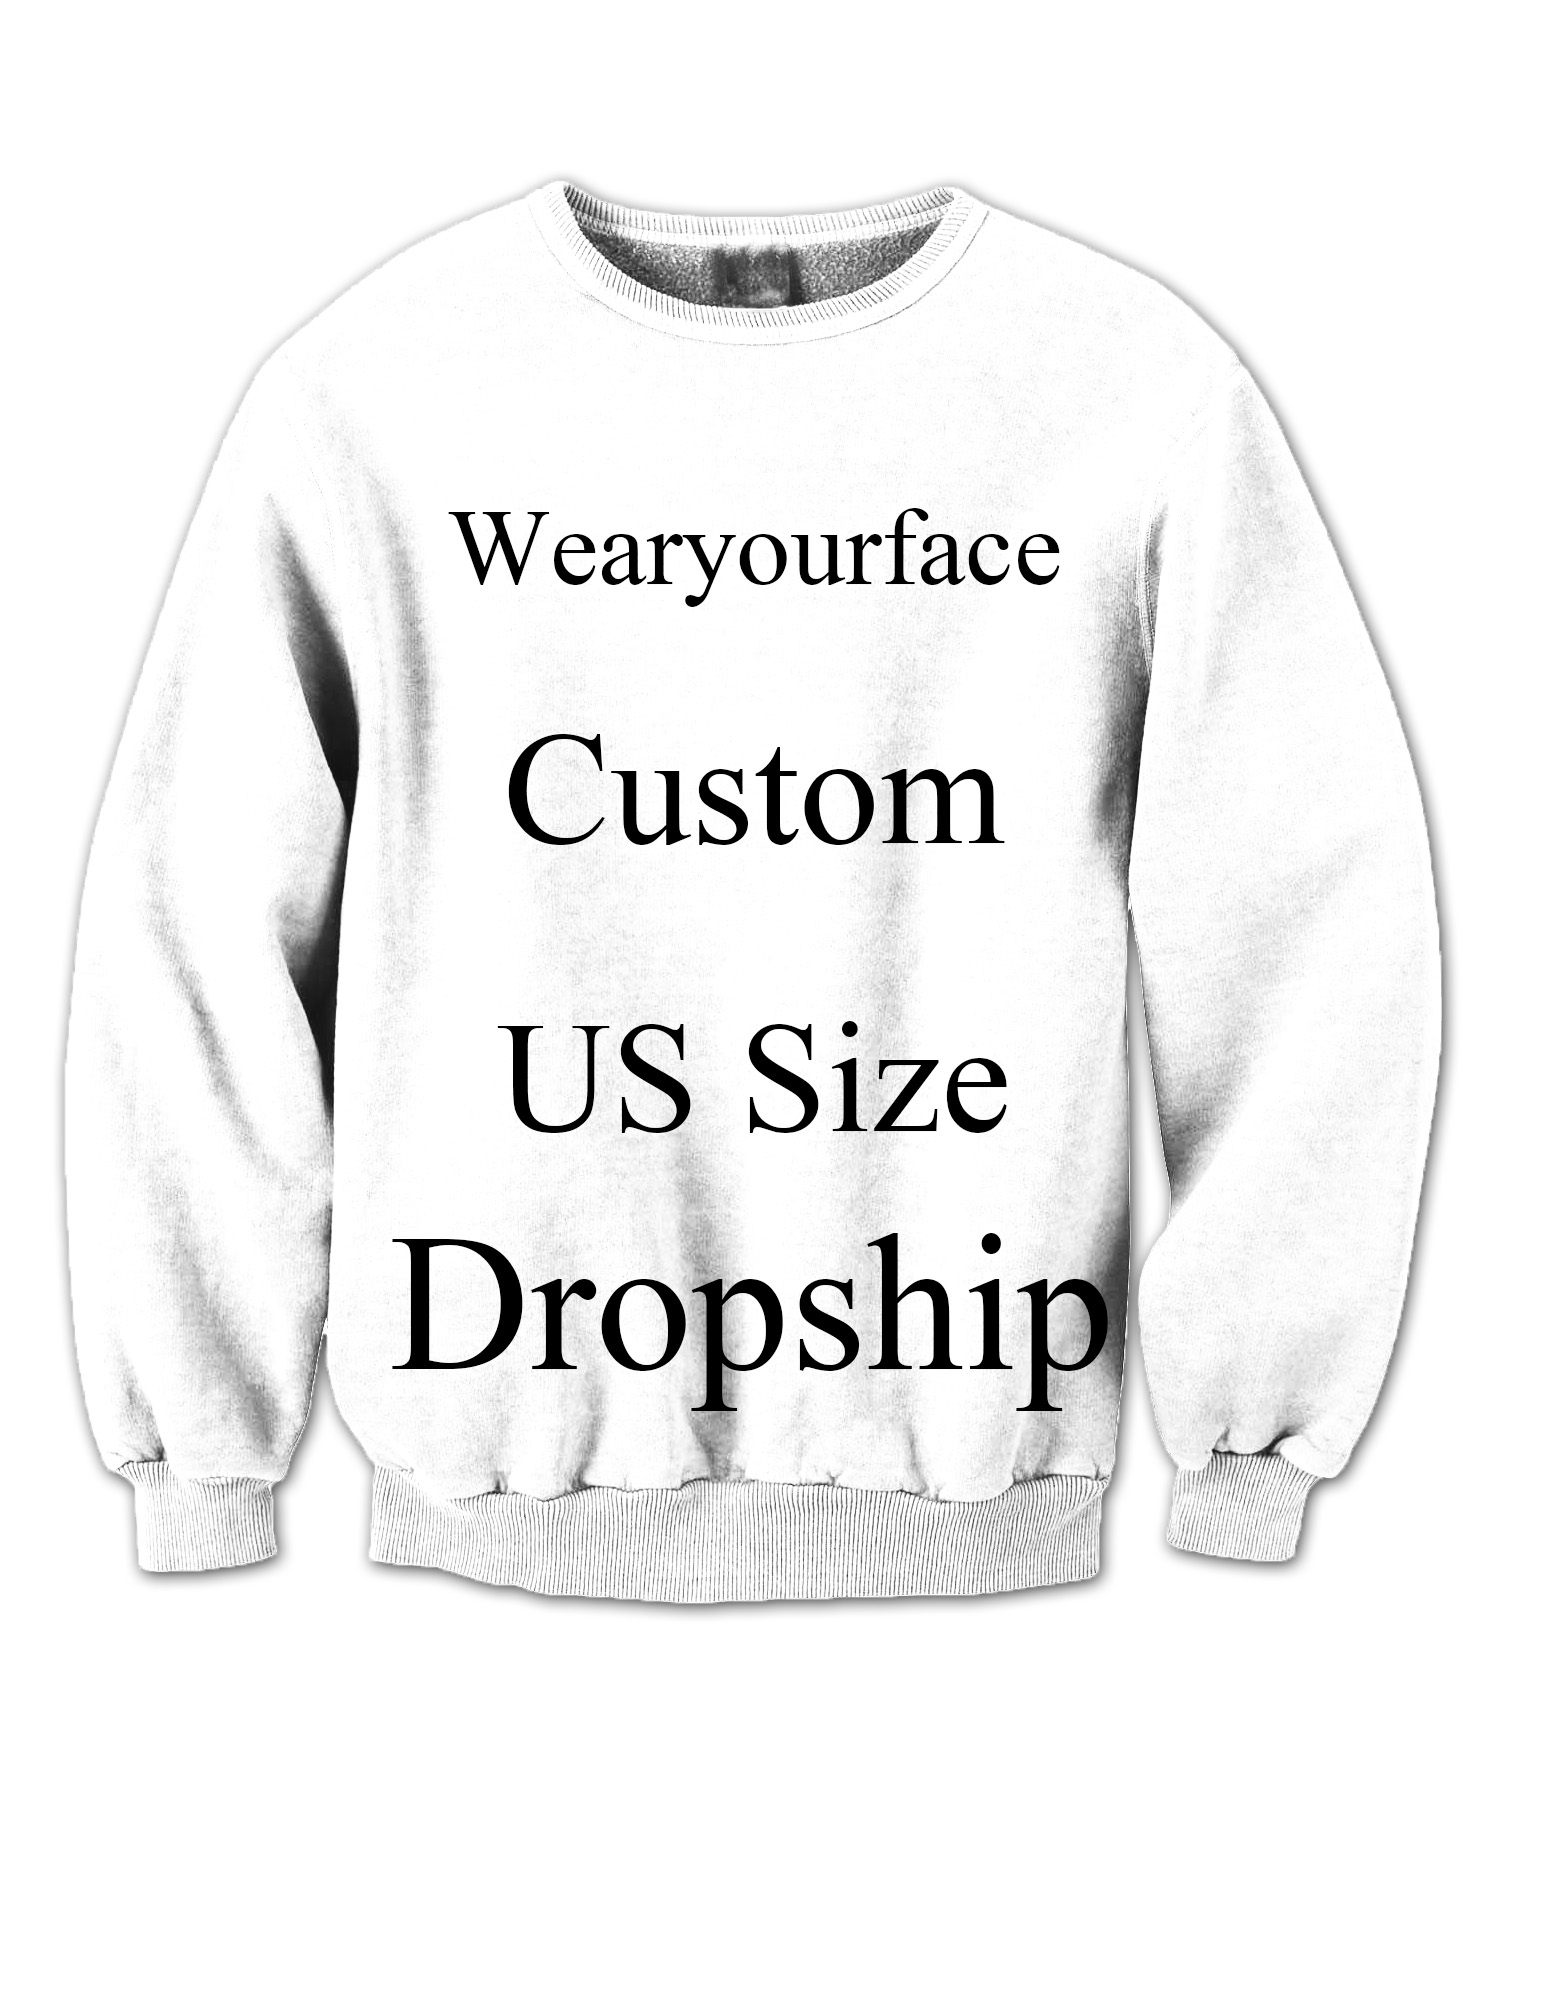 35554b3d9bd6 Custom Dropship US Size 3D All Over Printed Crewneck Sweatshirts Tracksuits Streetwear  Outfits Sweats For Kid Women Men Sets